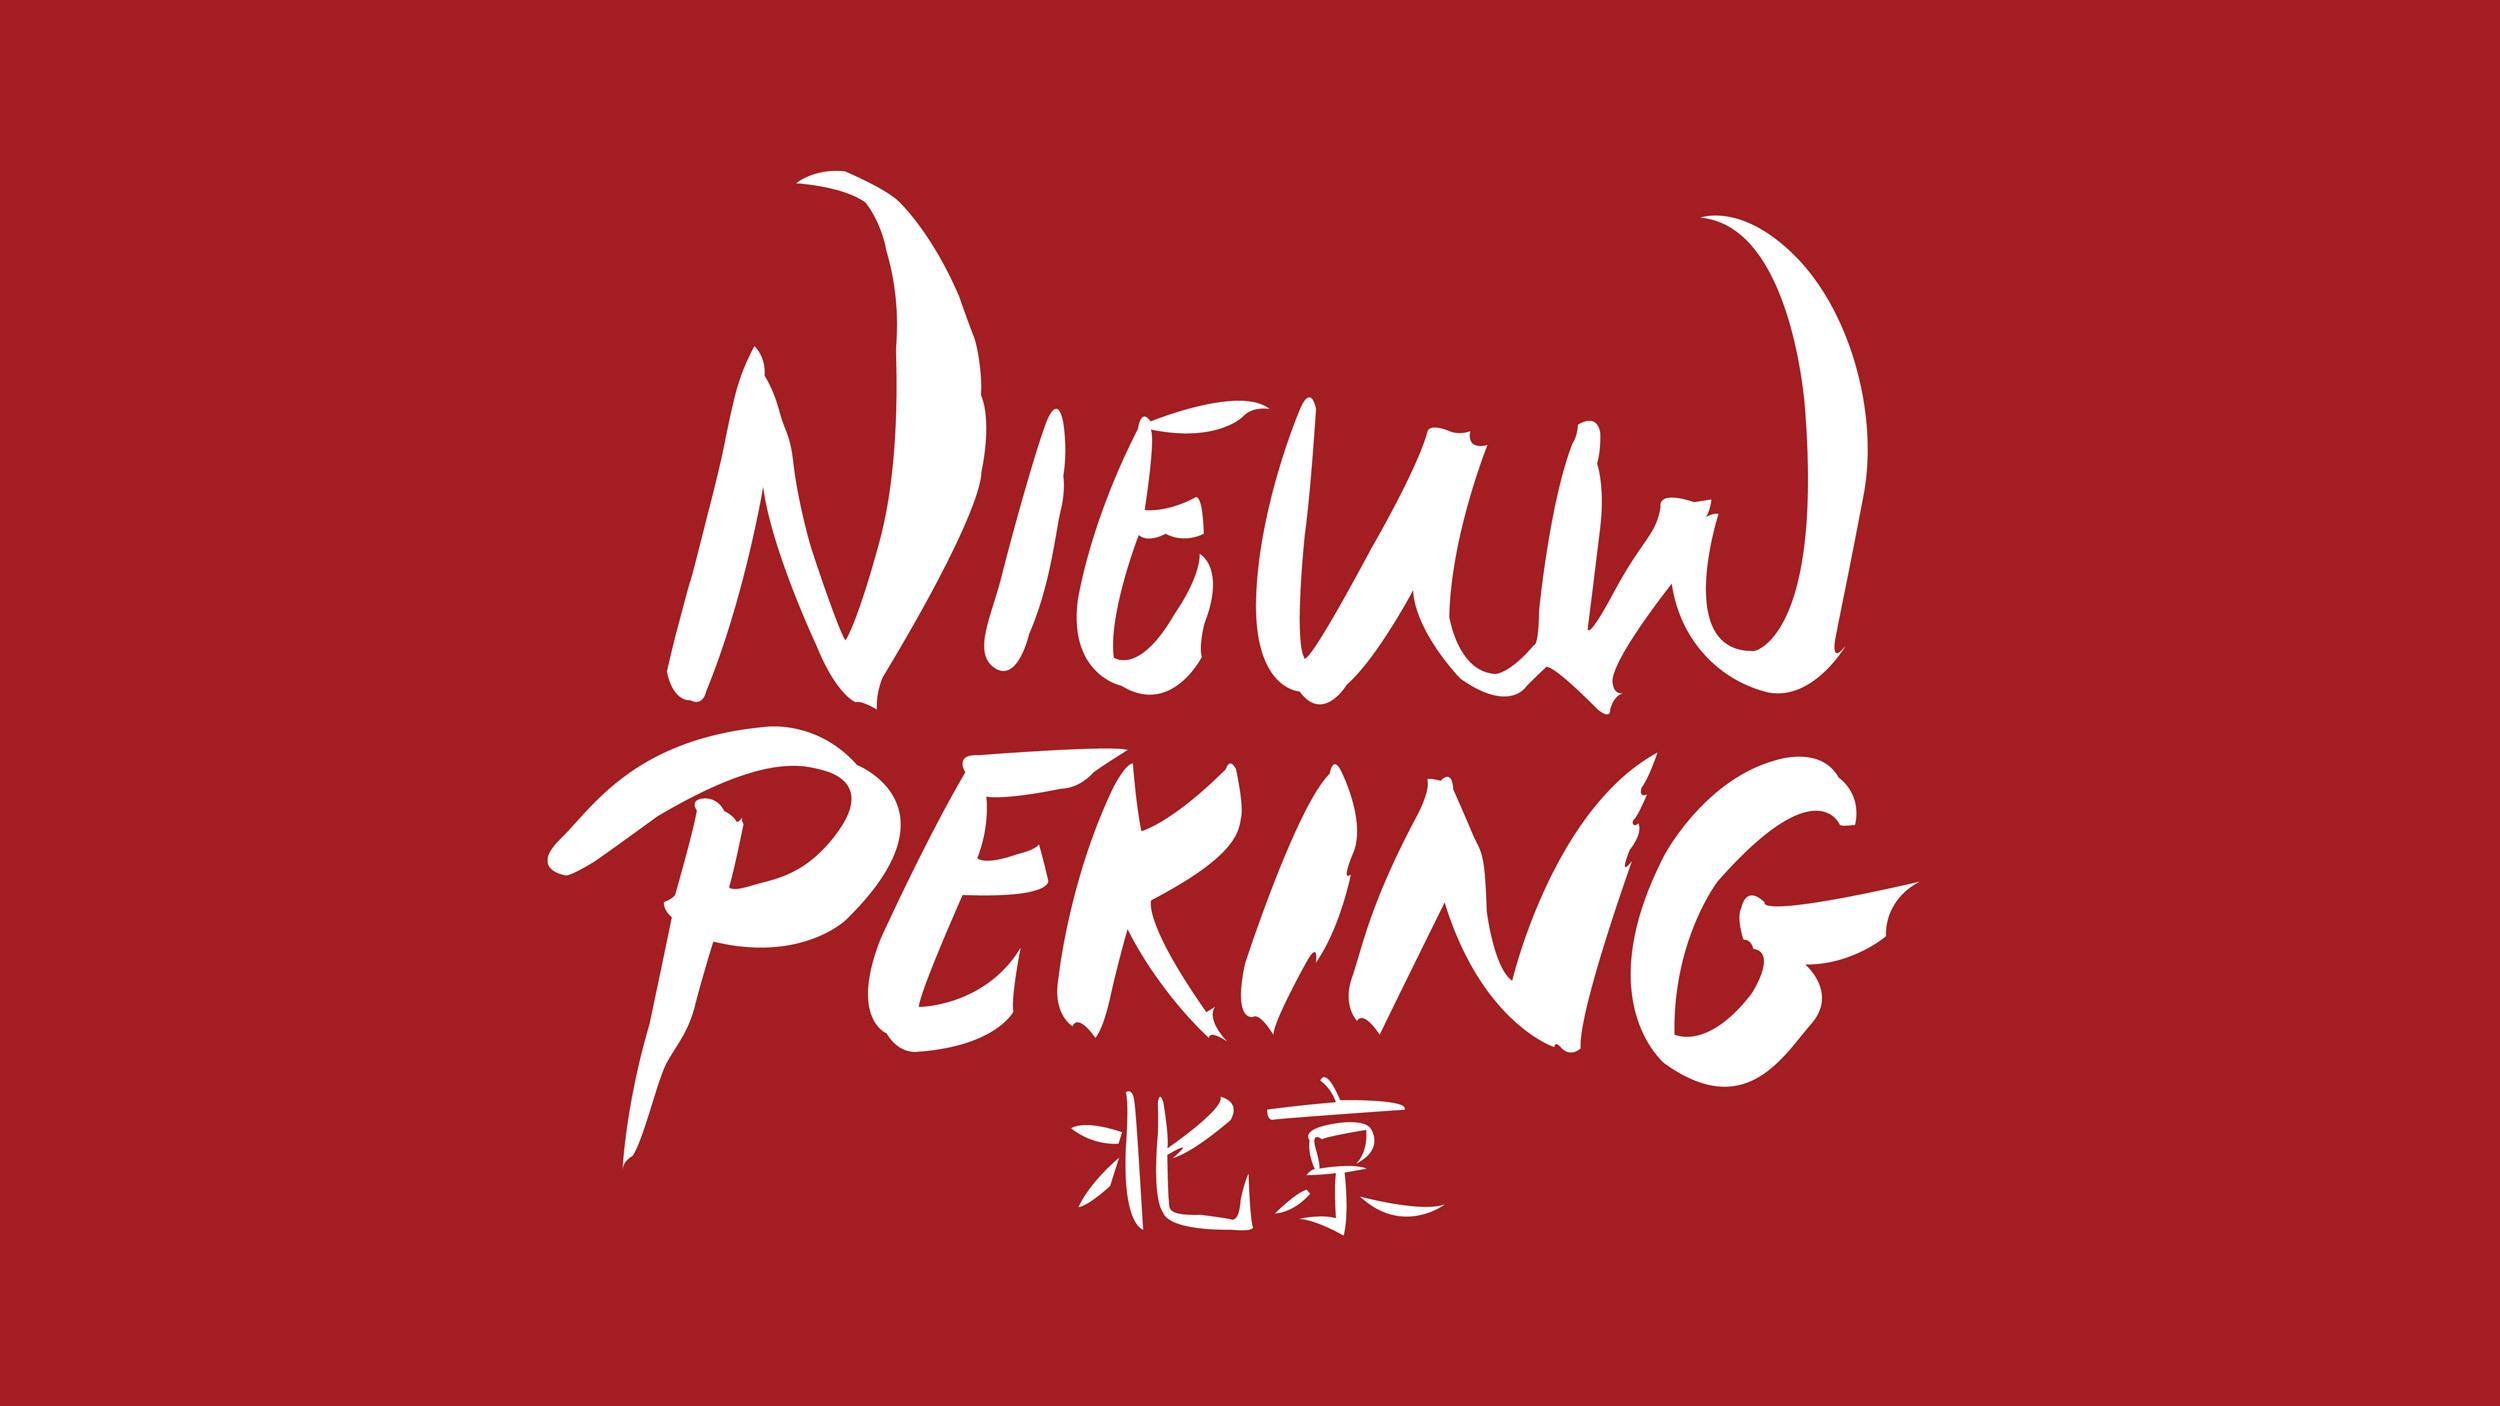 Nieuw Peking, logo, Mixus studio